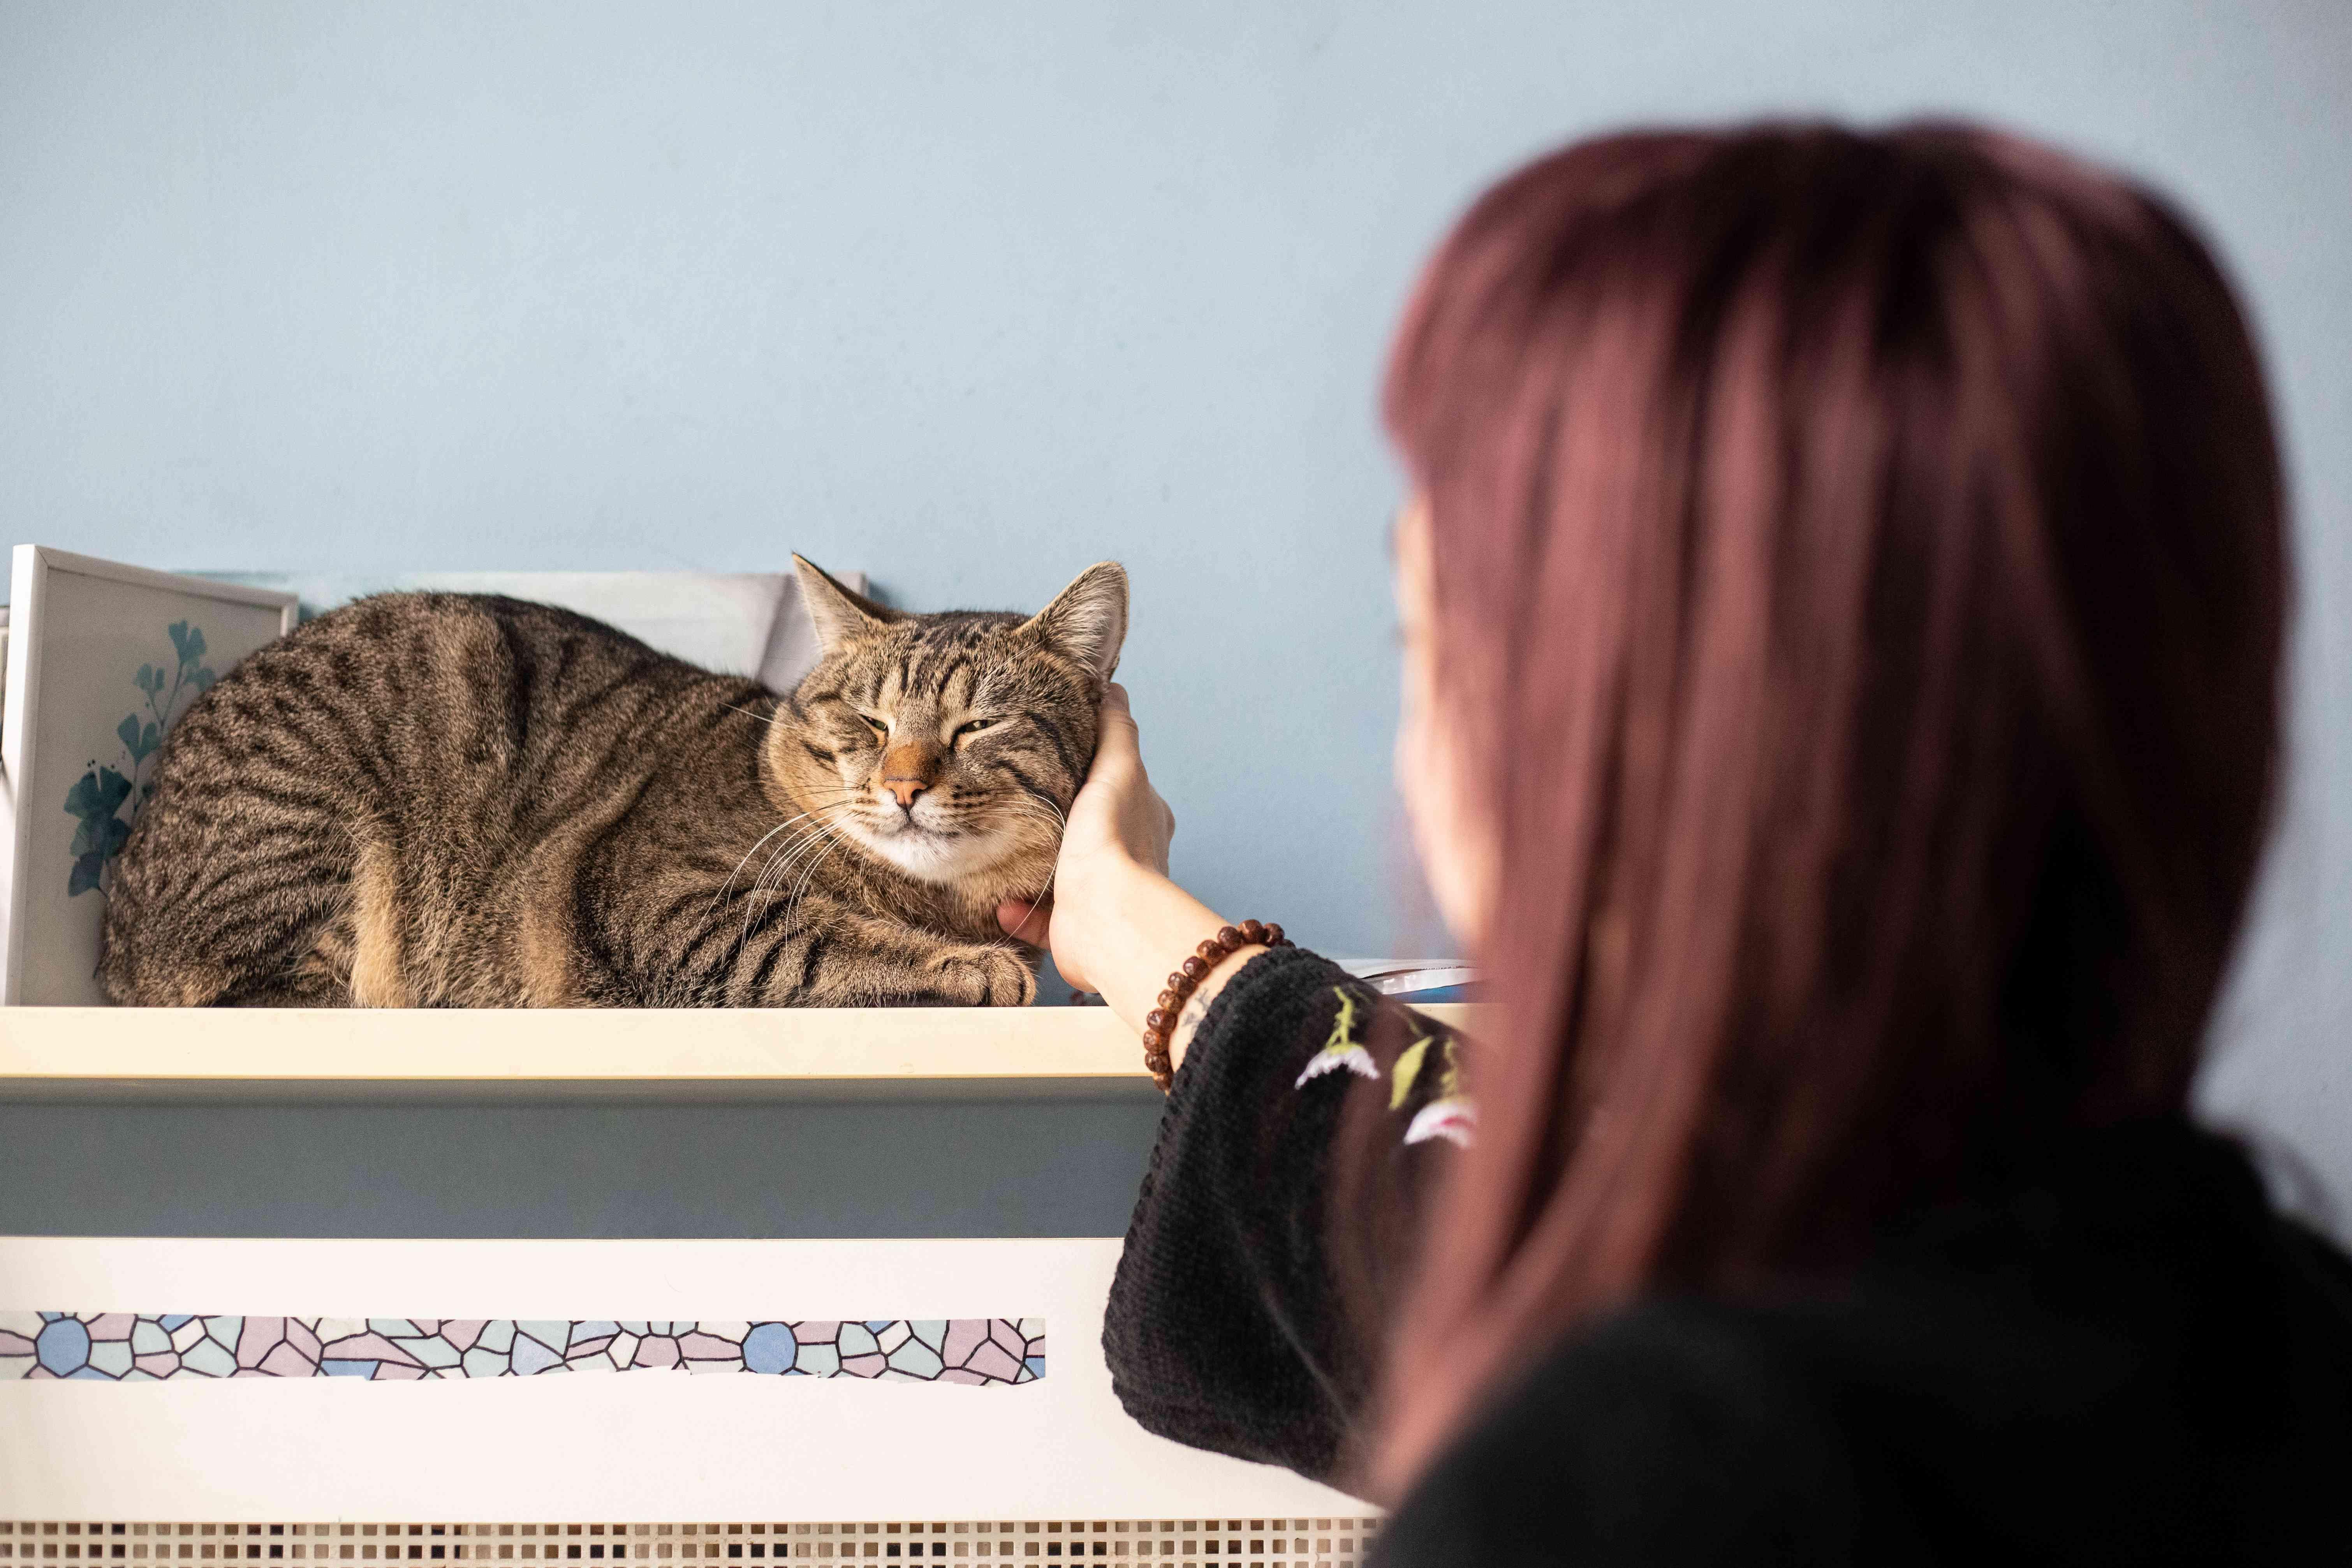 women in foreground scratches kitty cheek on bookshelf